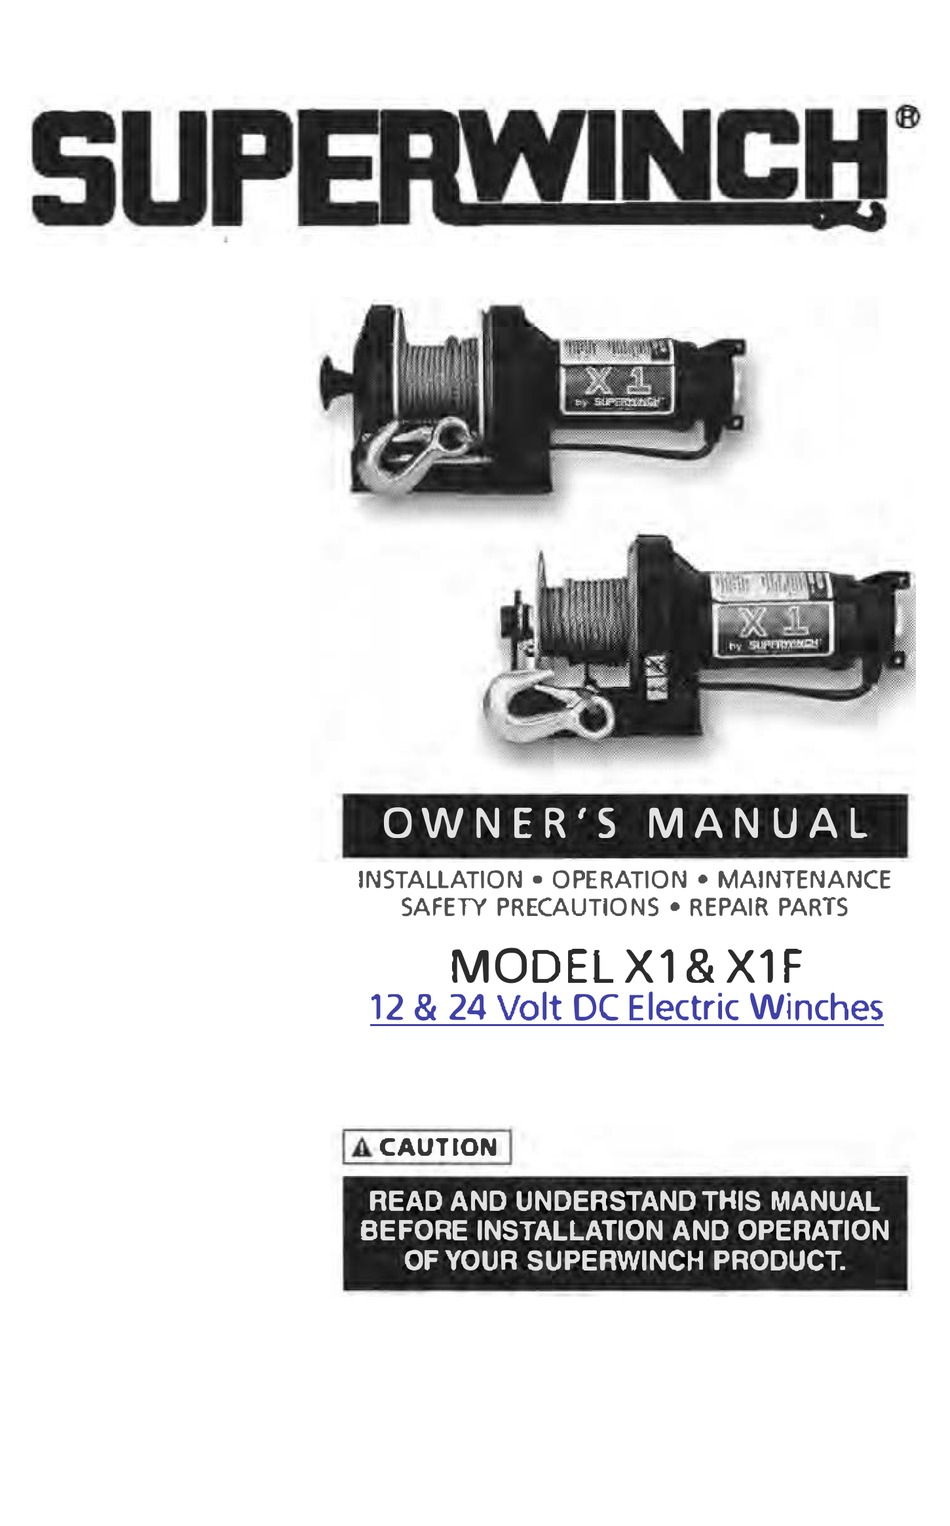 SUPERWINCH X1 OWNER'S MANUAL Pdf Download | ManualsLib | X1 Superwinch Wiring Diagram |  | ManualsLib